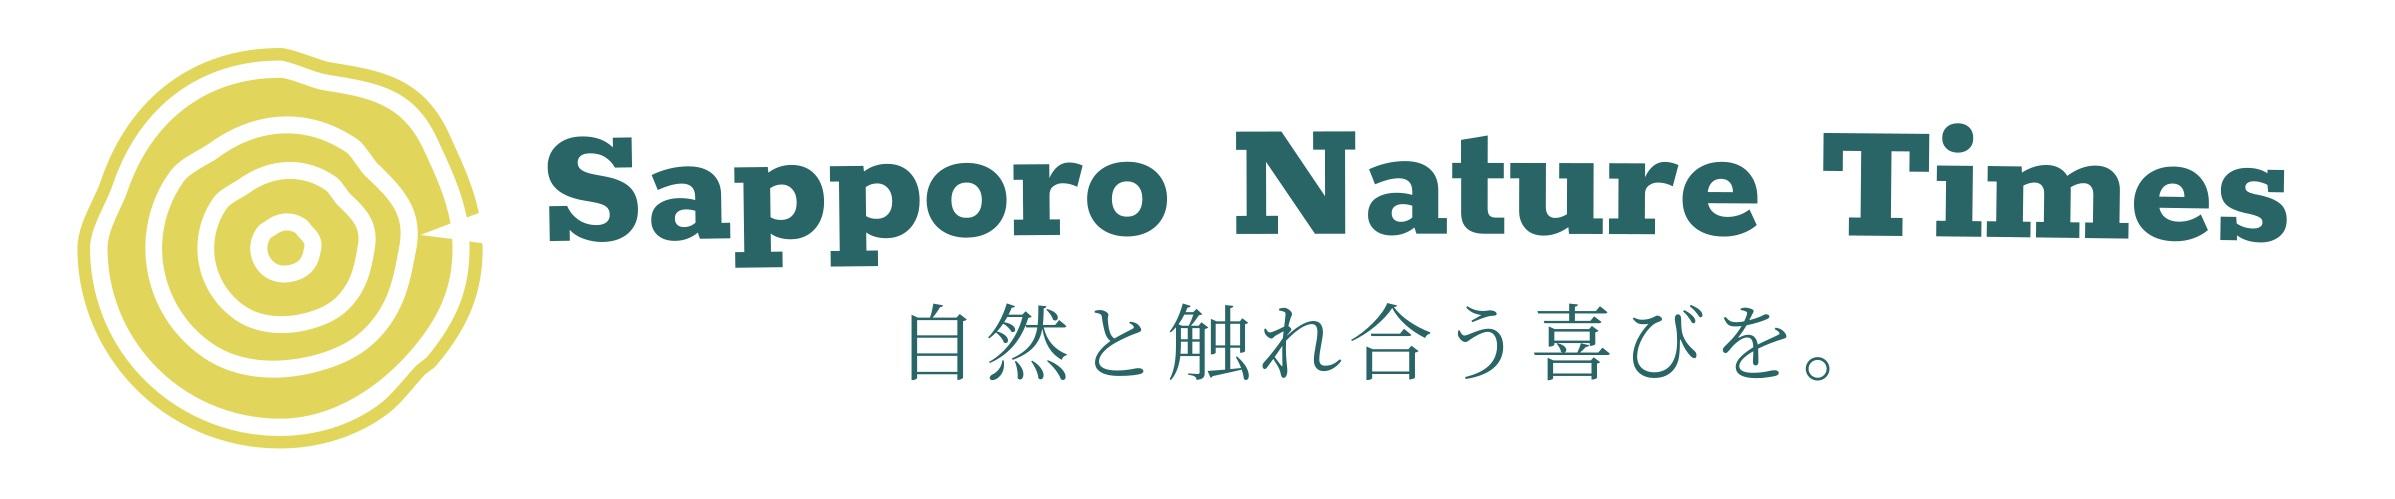 Sapporo Nature Times ‐ 札幌ネイチャータイムズ